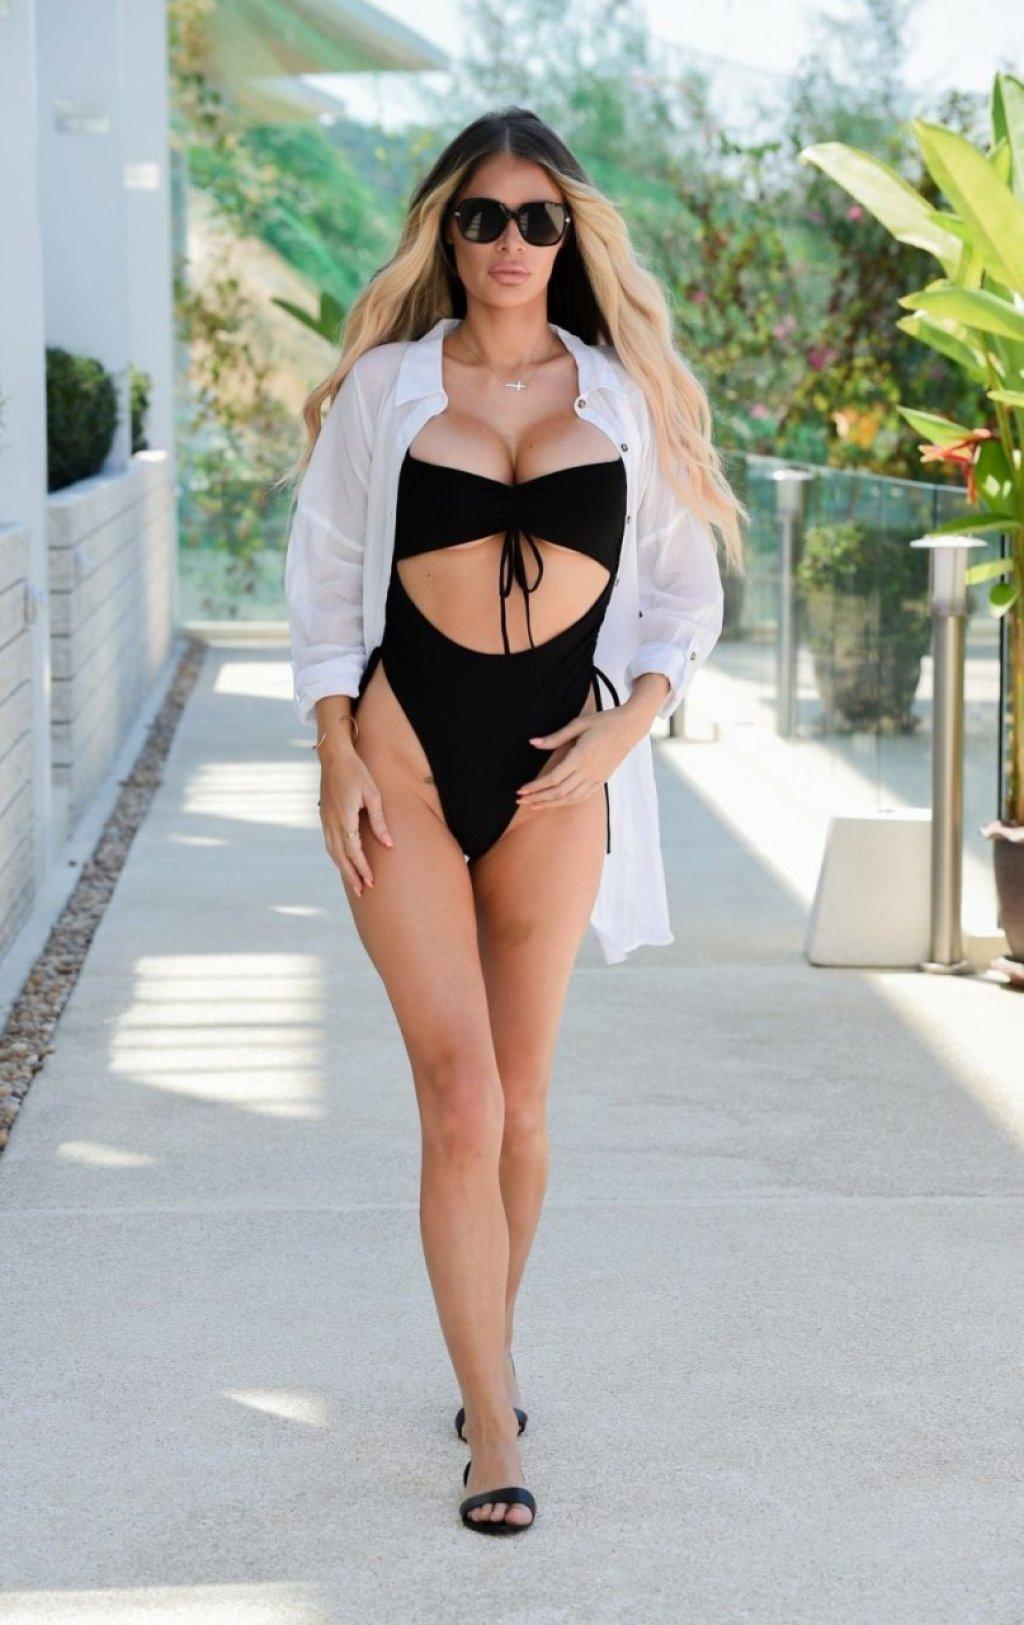 Chloe Sims, Demi Sims, Chloe Ross, Georgia Kousoulou Sexy (21 Photos)